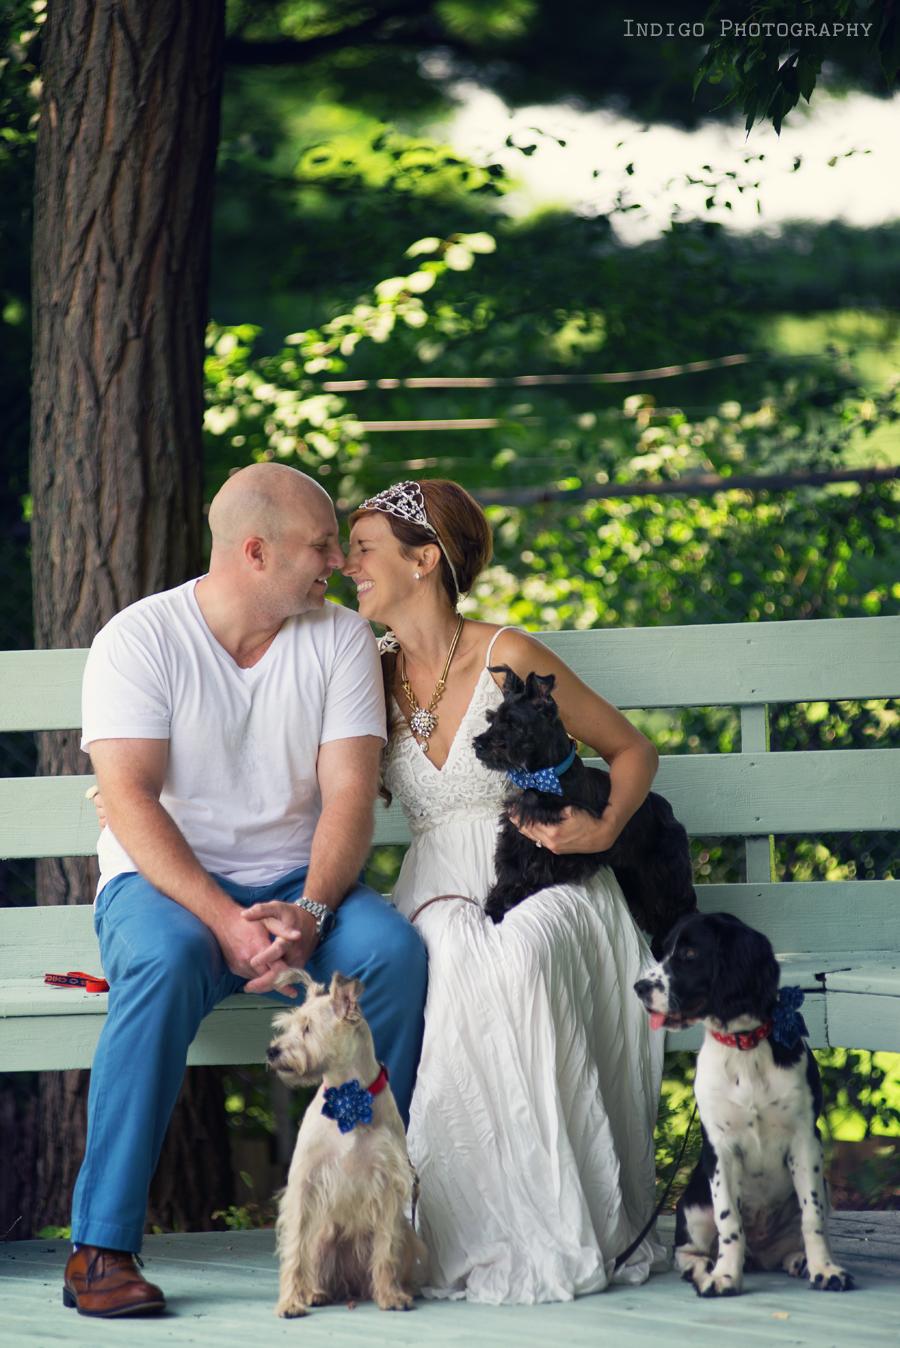 rockford-il-wedding-photographers-indigo-photography